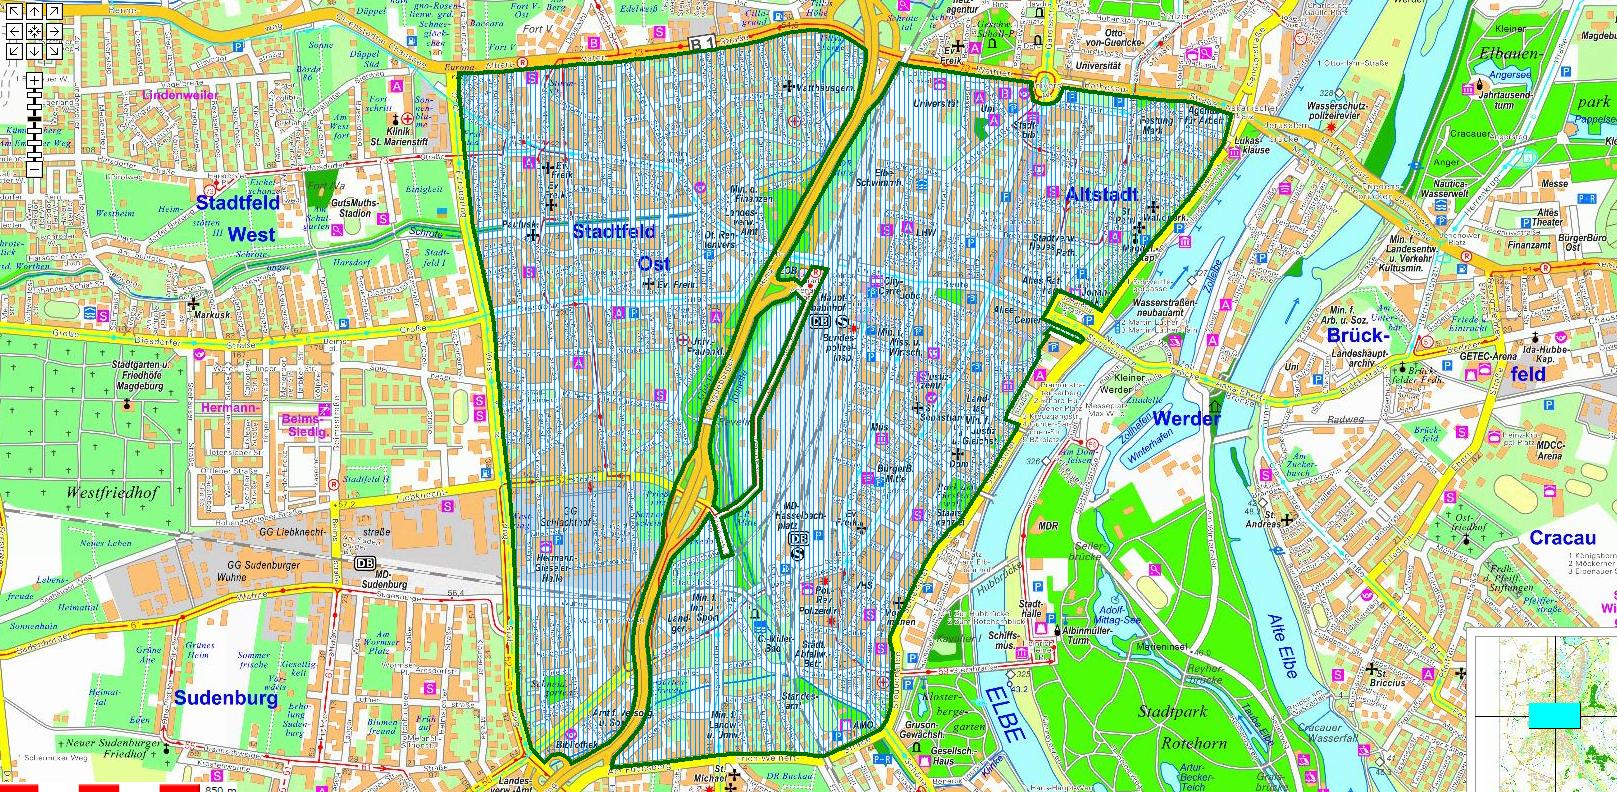 Umweltzone Leipzig Karte.Magdeburg Kontrolliert Umweltplaketten Radio Saw